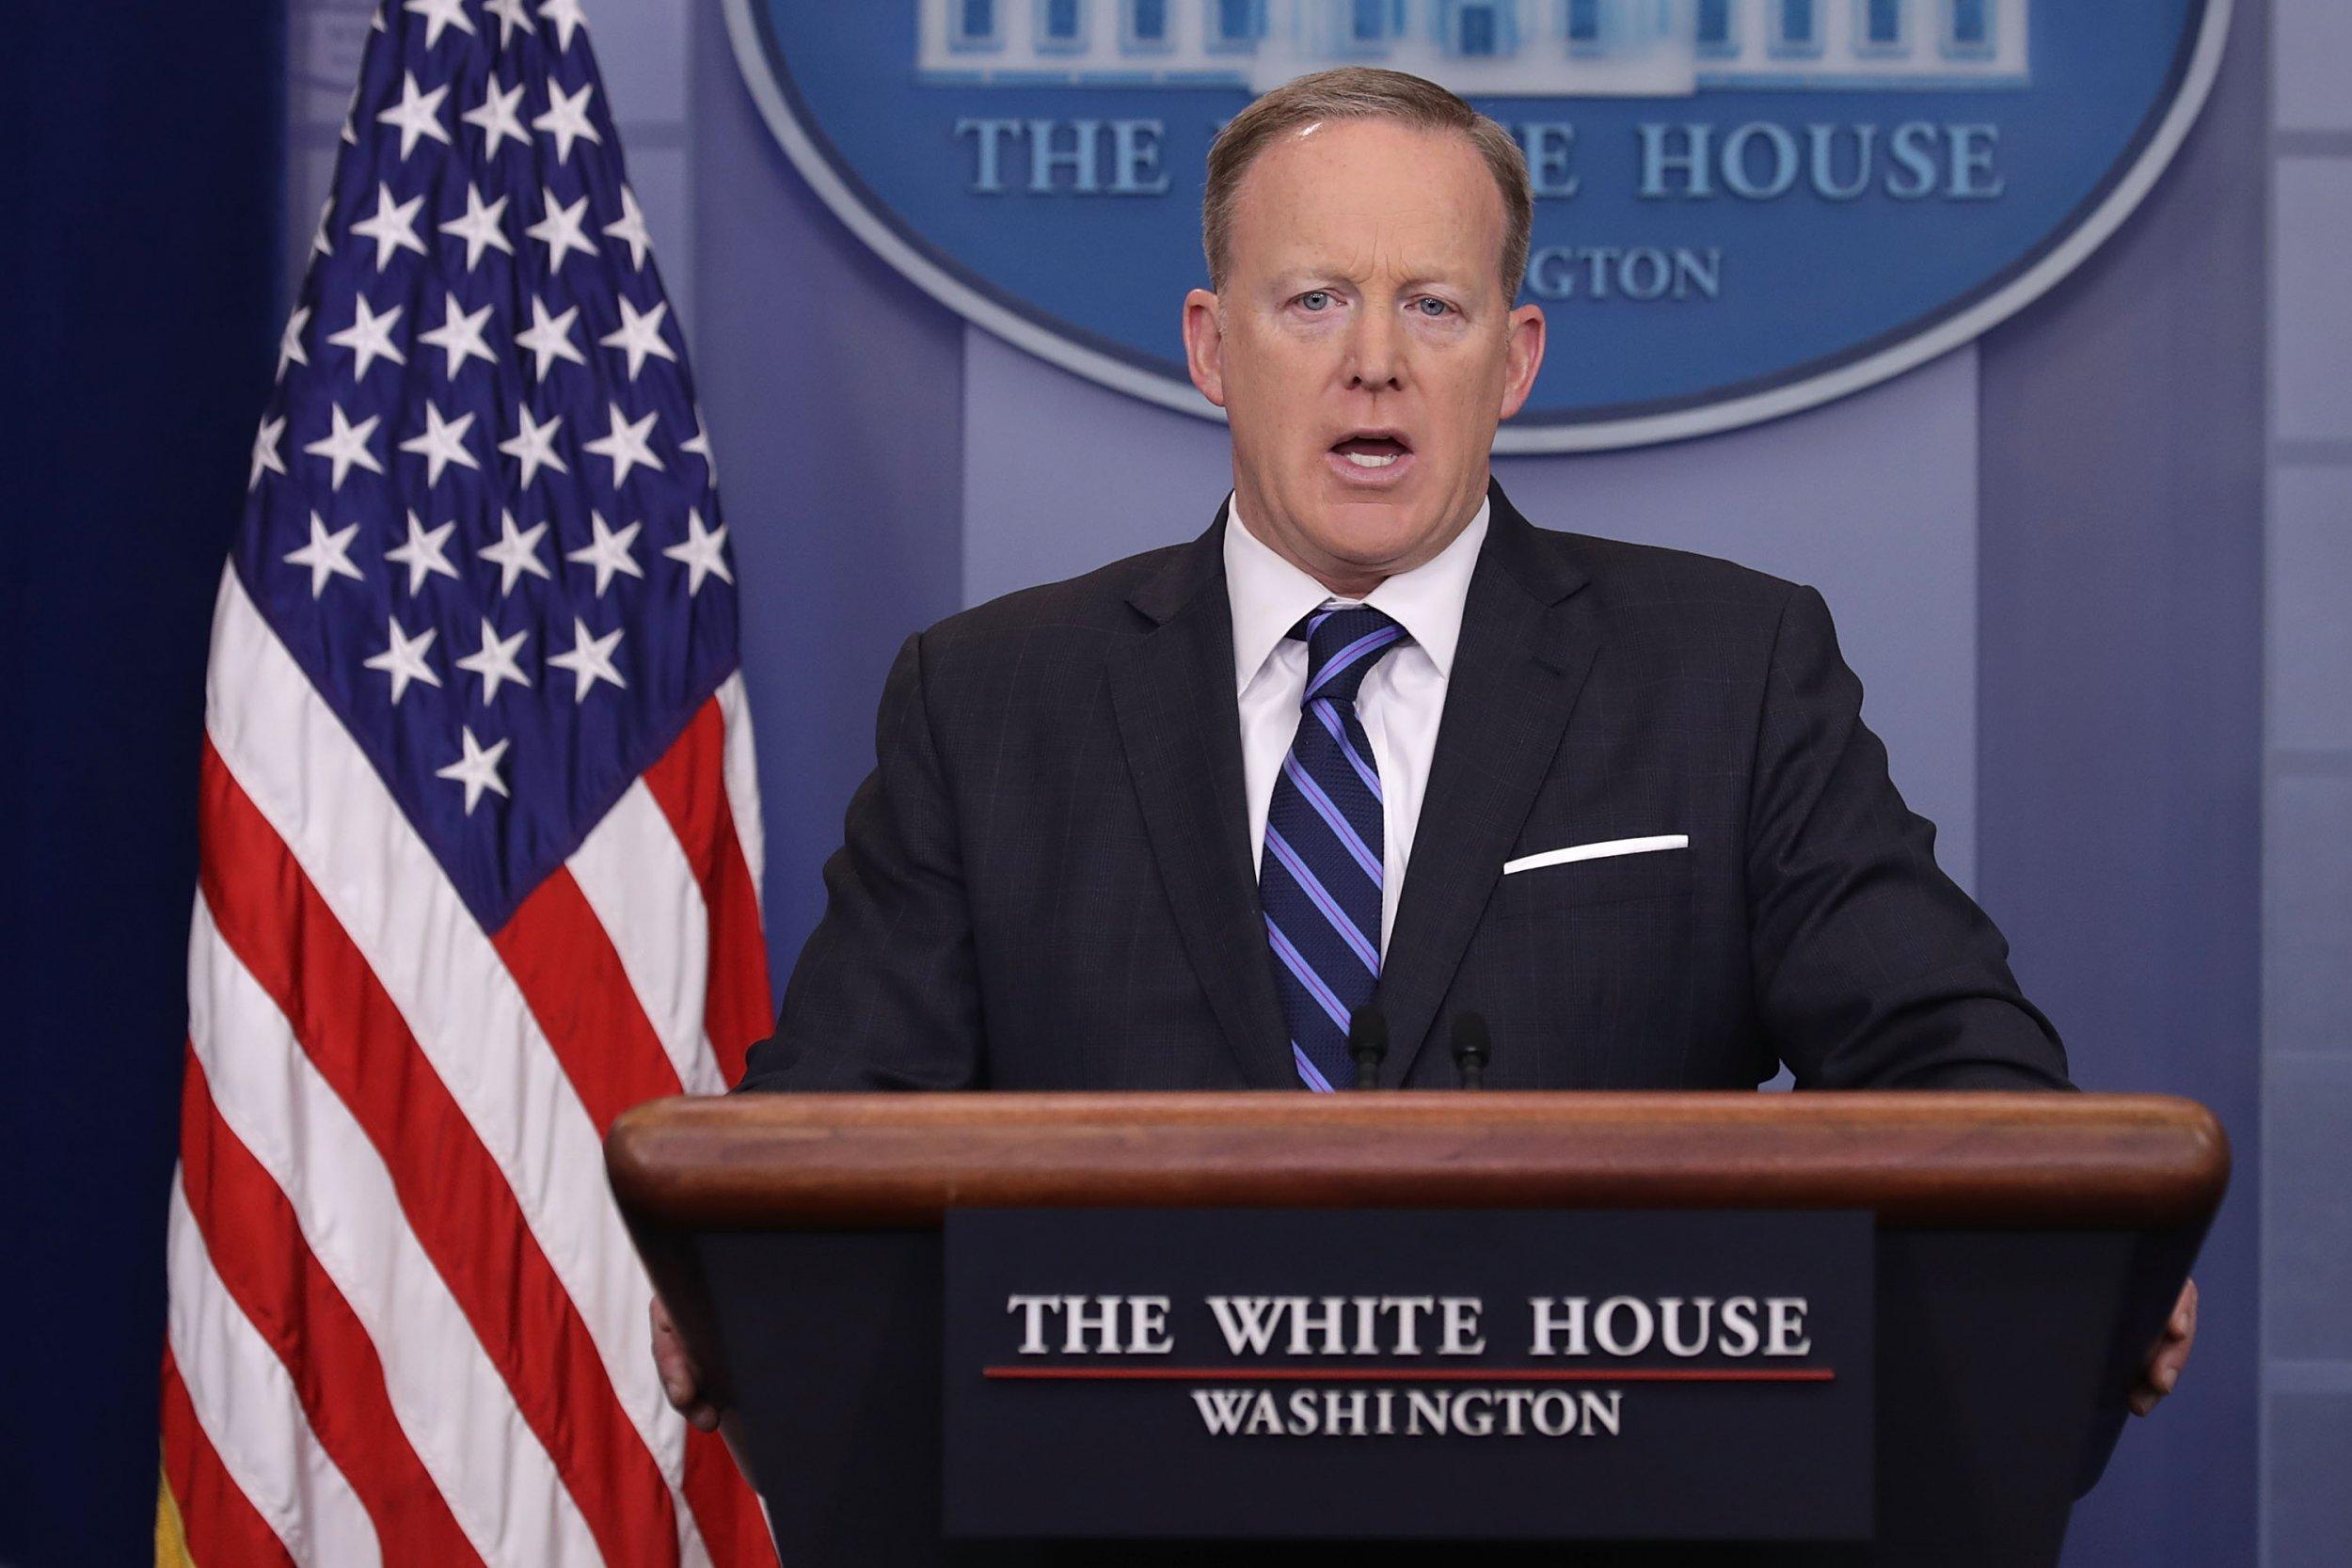 Sean Spicer's White House briefing